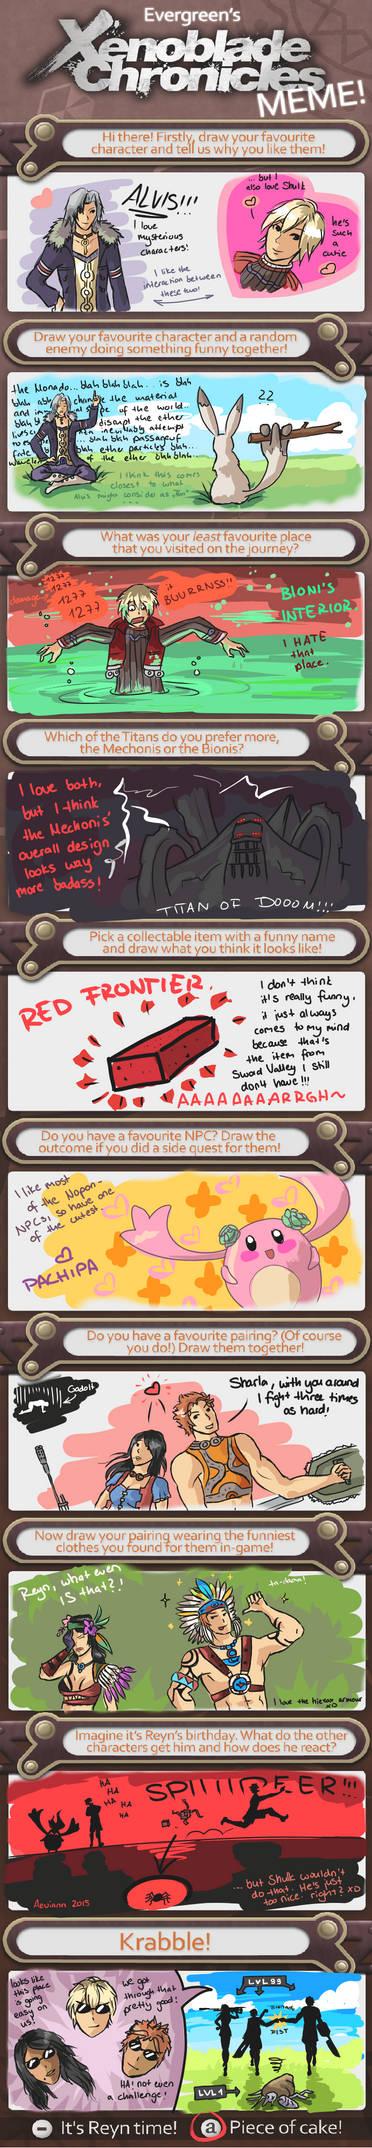 Xenoblade Chronicles Meme!